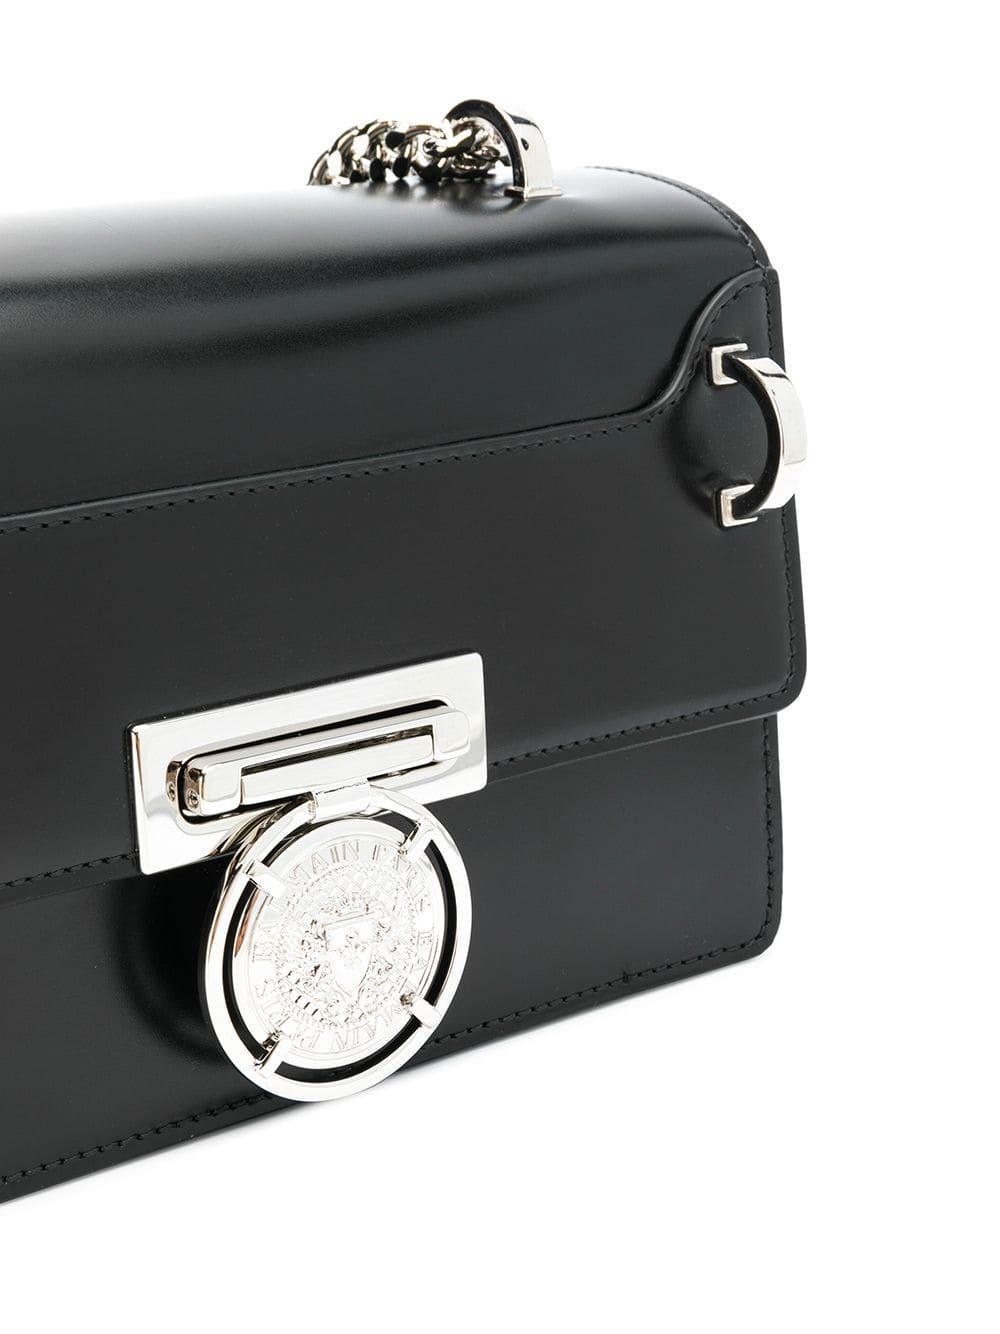 fbb509b4817a Сумка На Плечо 'box' Balmain, цвет: Черный - Lyst